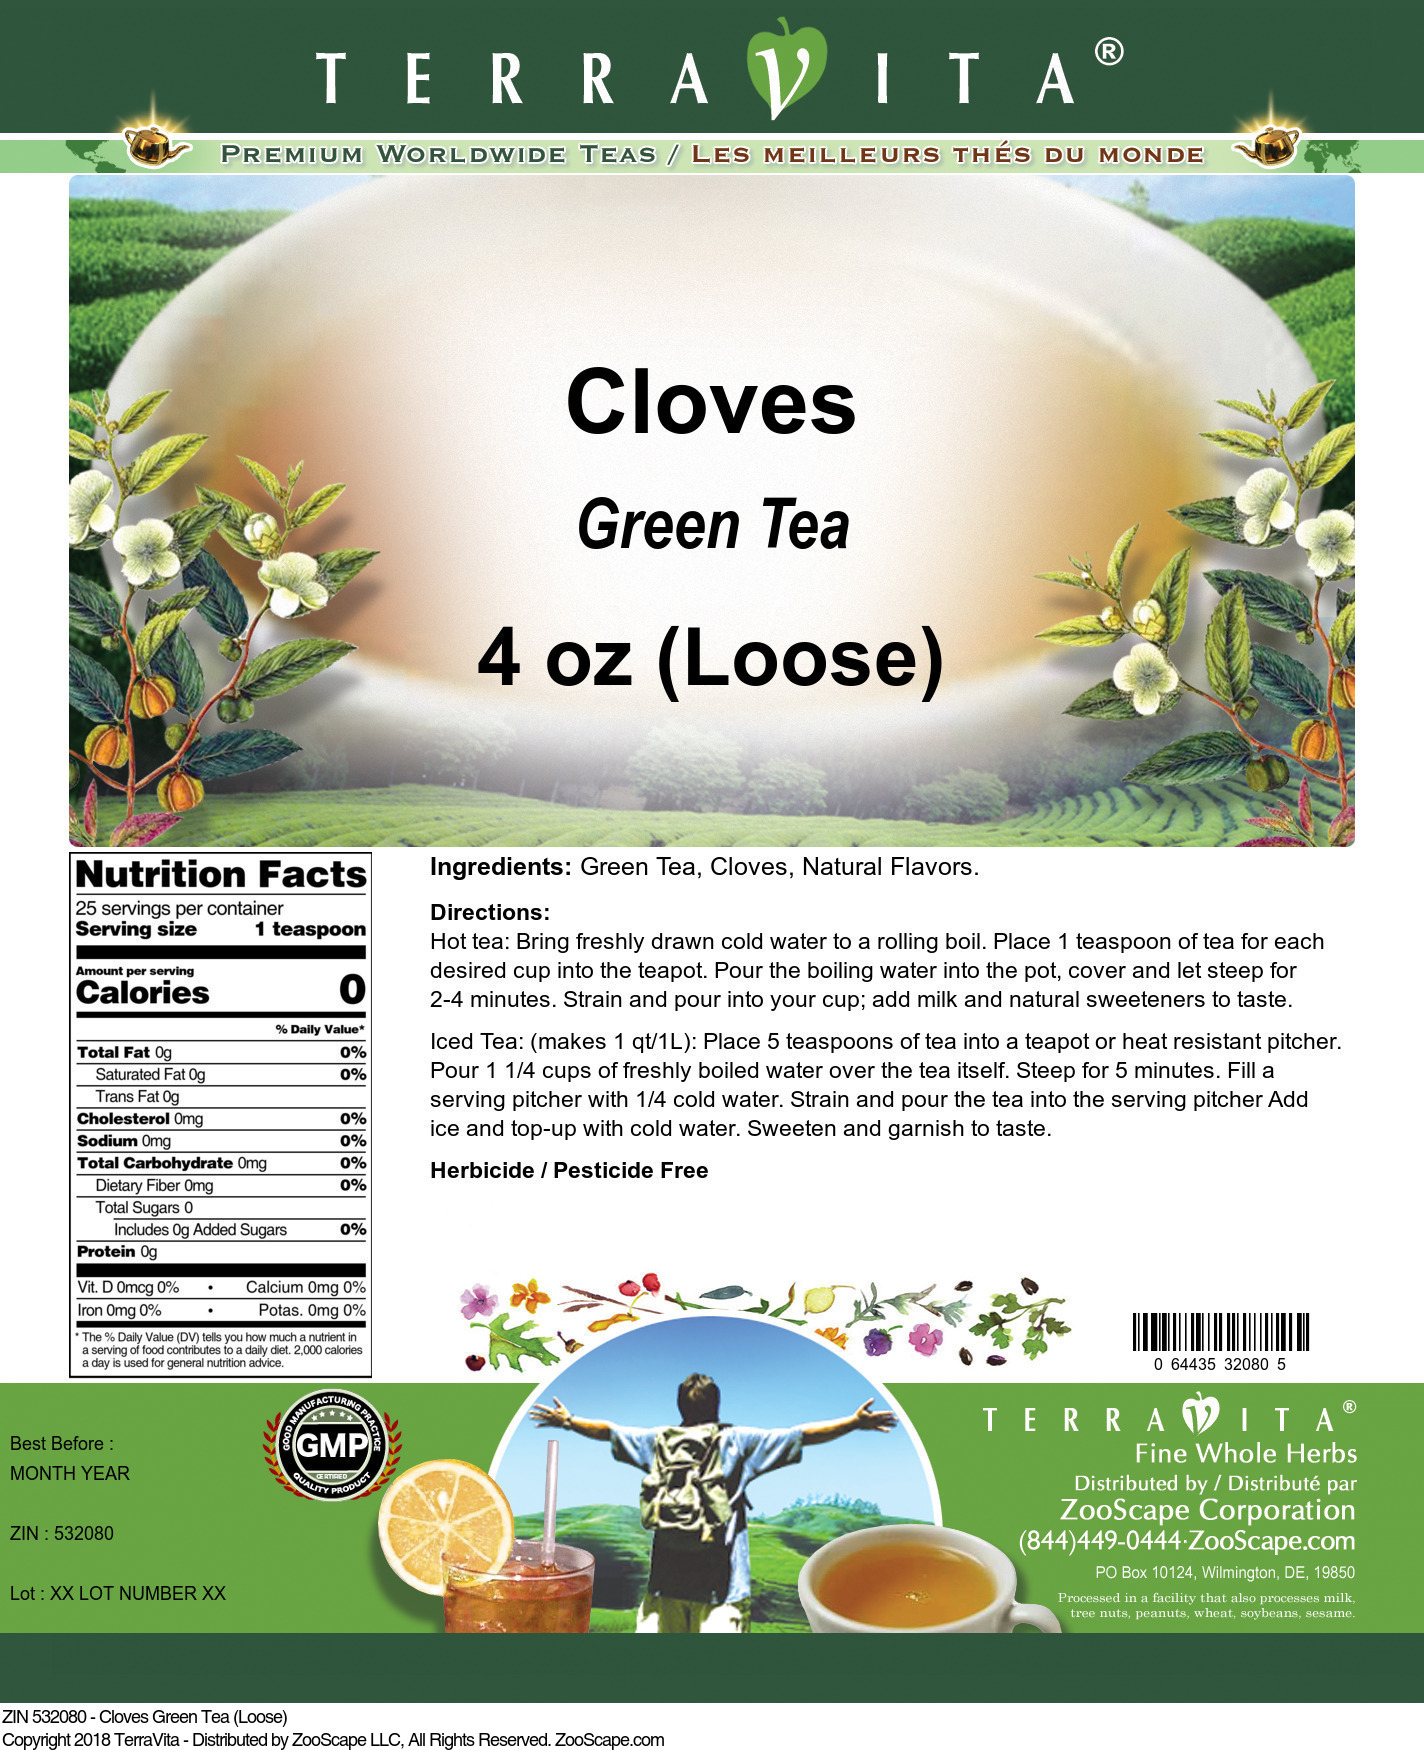 Cloves Green Tea (Loose)